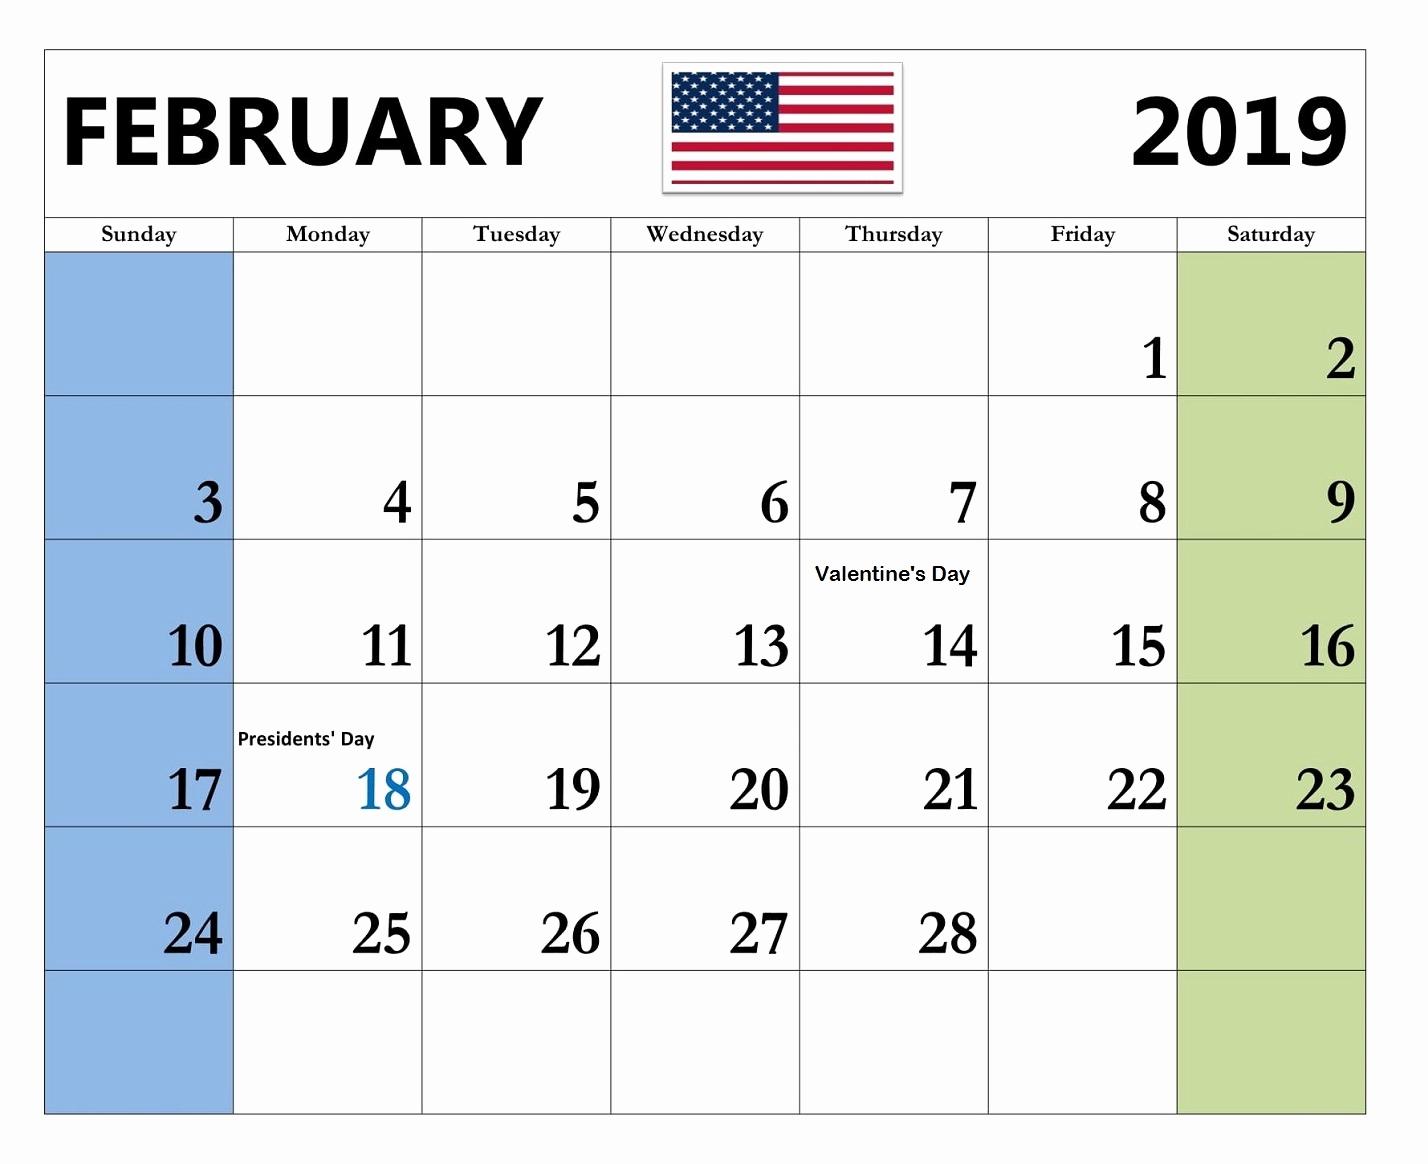 2019 Monthly Calendar Word Best Of February 2019 Calendar Word